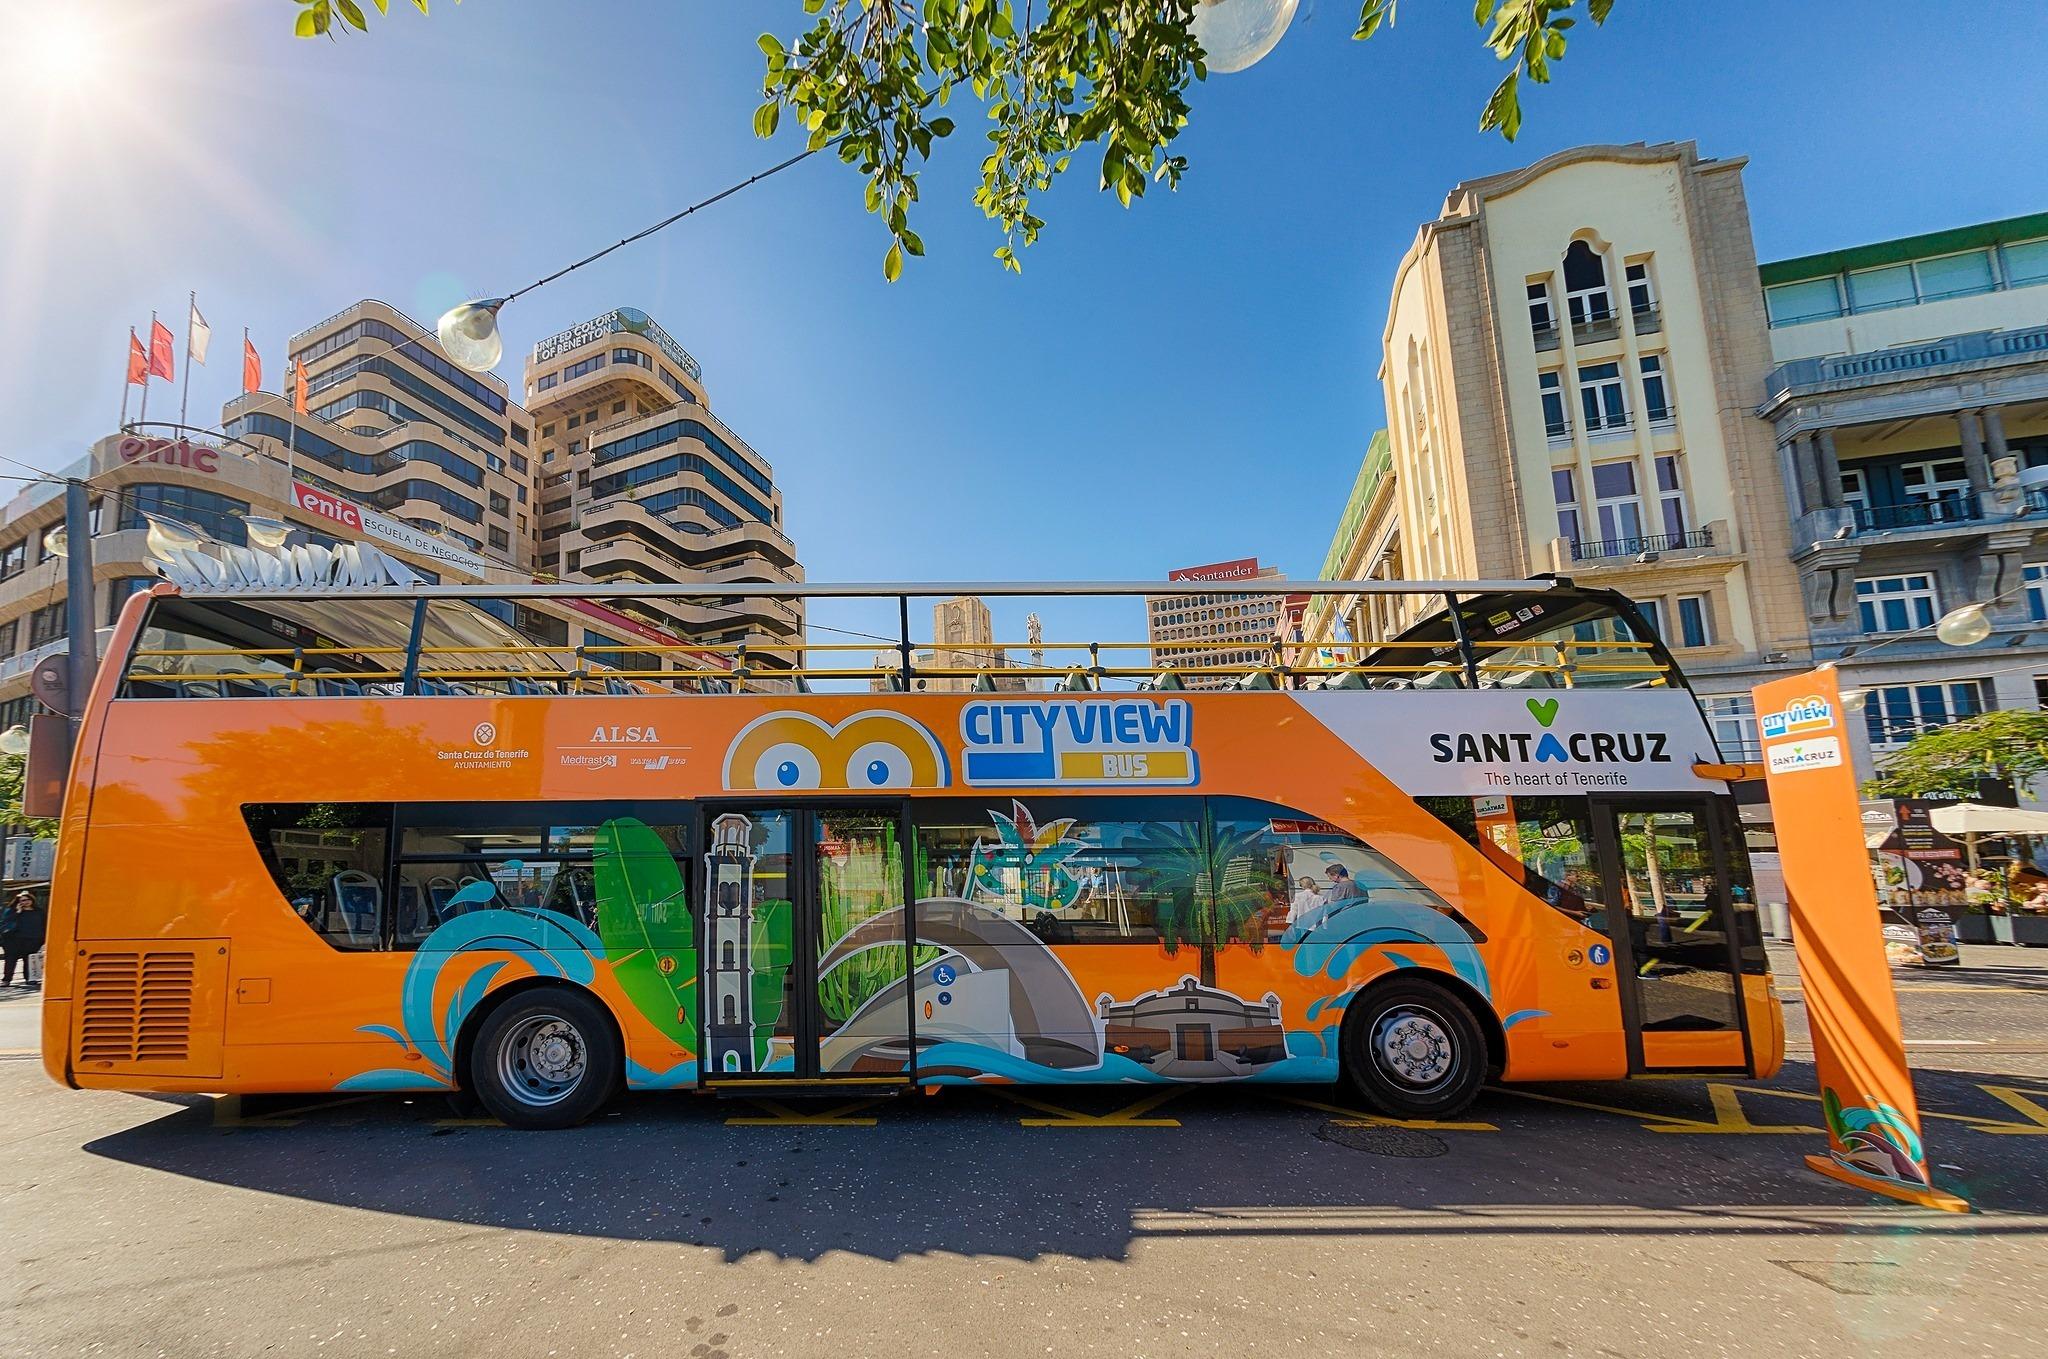 Tourist busses in Santa Cruz see increase in passenger numbers